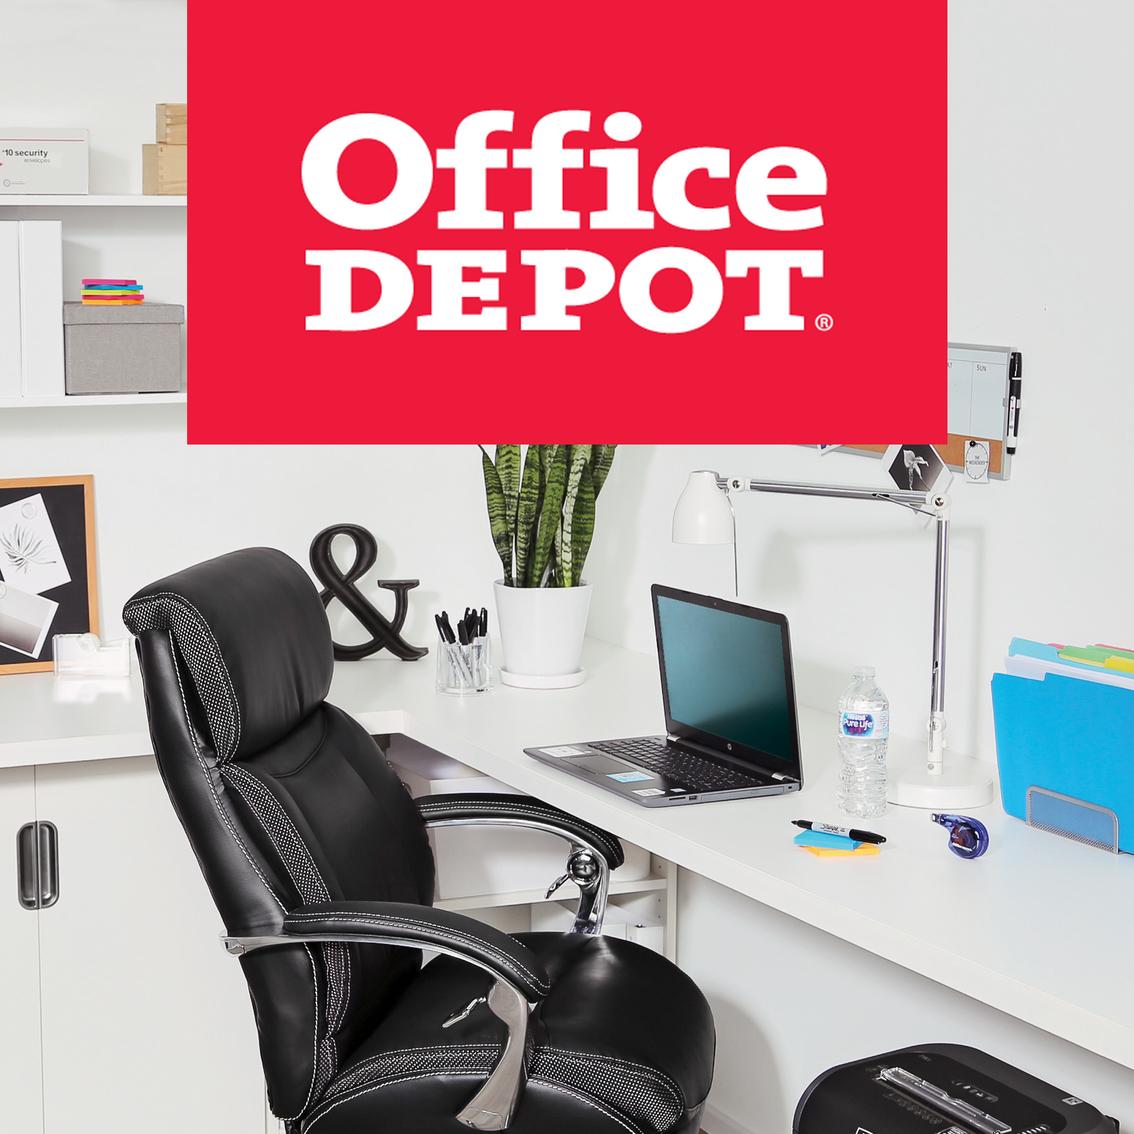 Desk Calendars Office Depot  Office Depot Hard Drives And Backup Electronics Shop